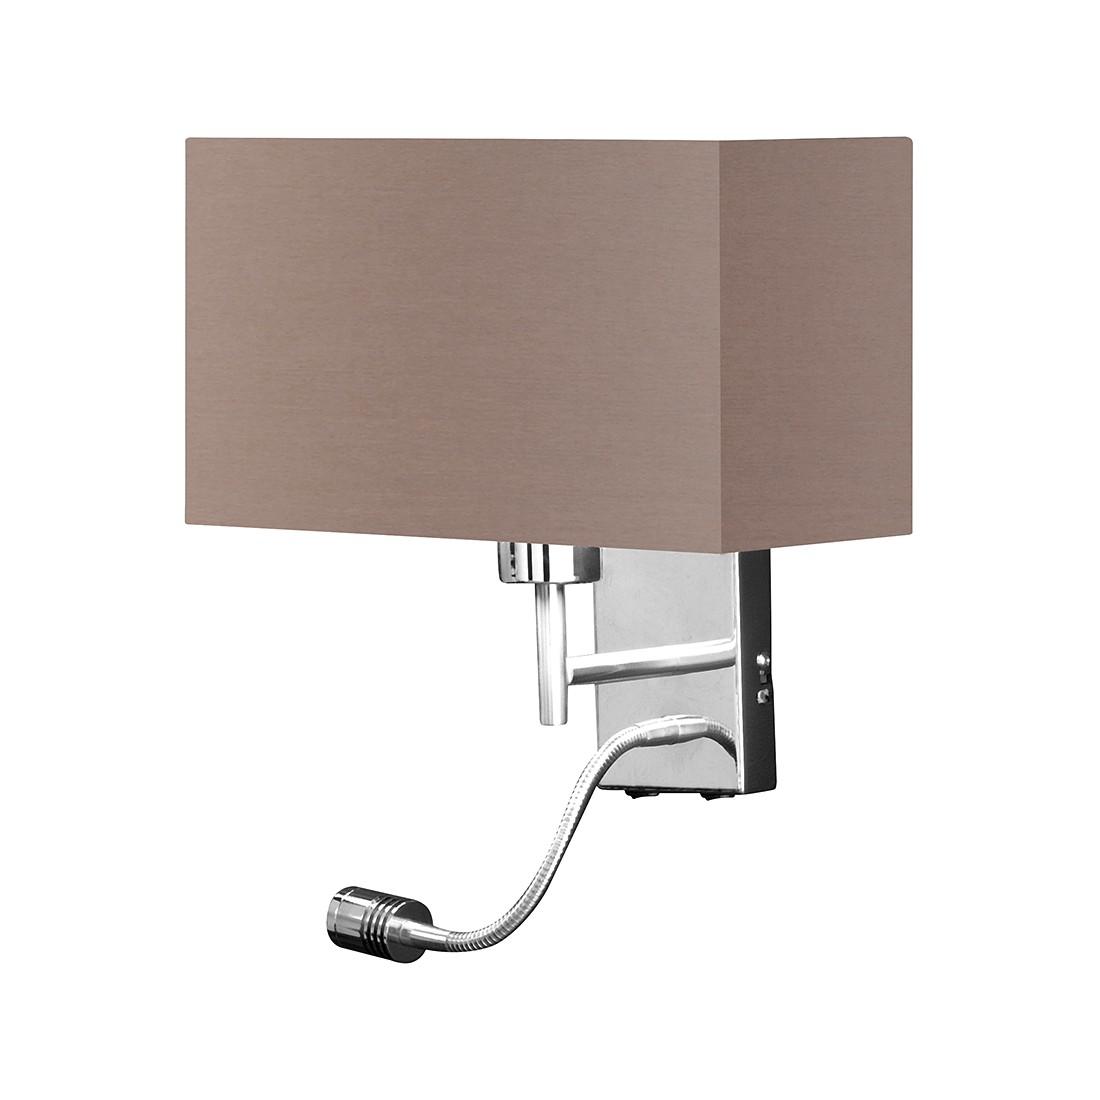 lampen binnenverlichting wandlampen. Black Bedroom Furniture Sets. Home Design Ideas